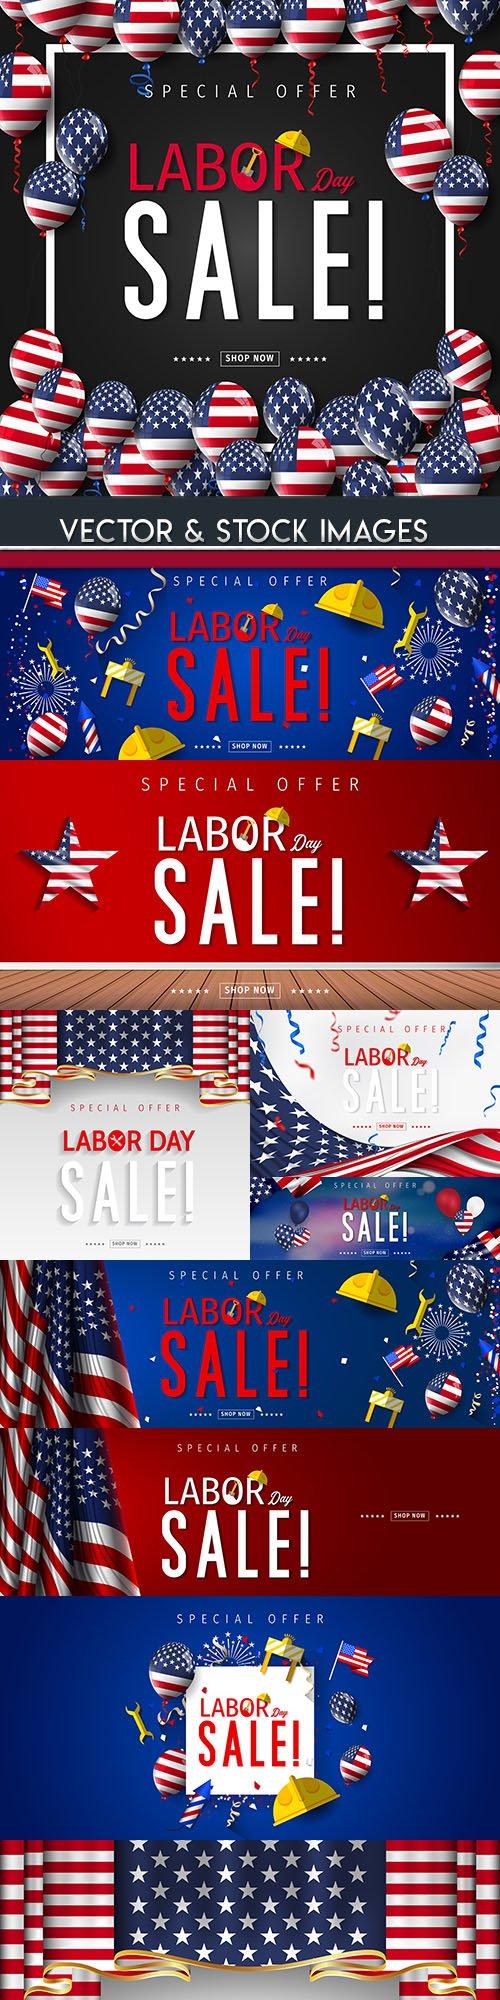 Labor Day sale illustration design collection